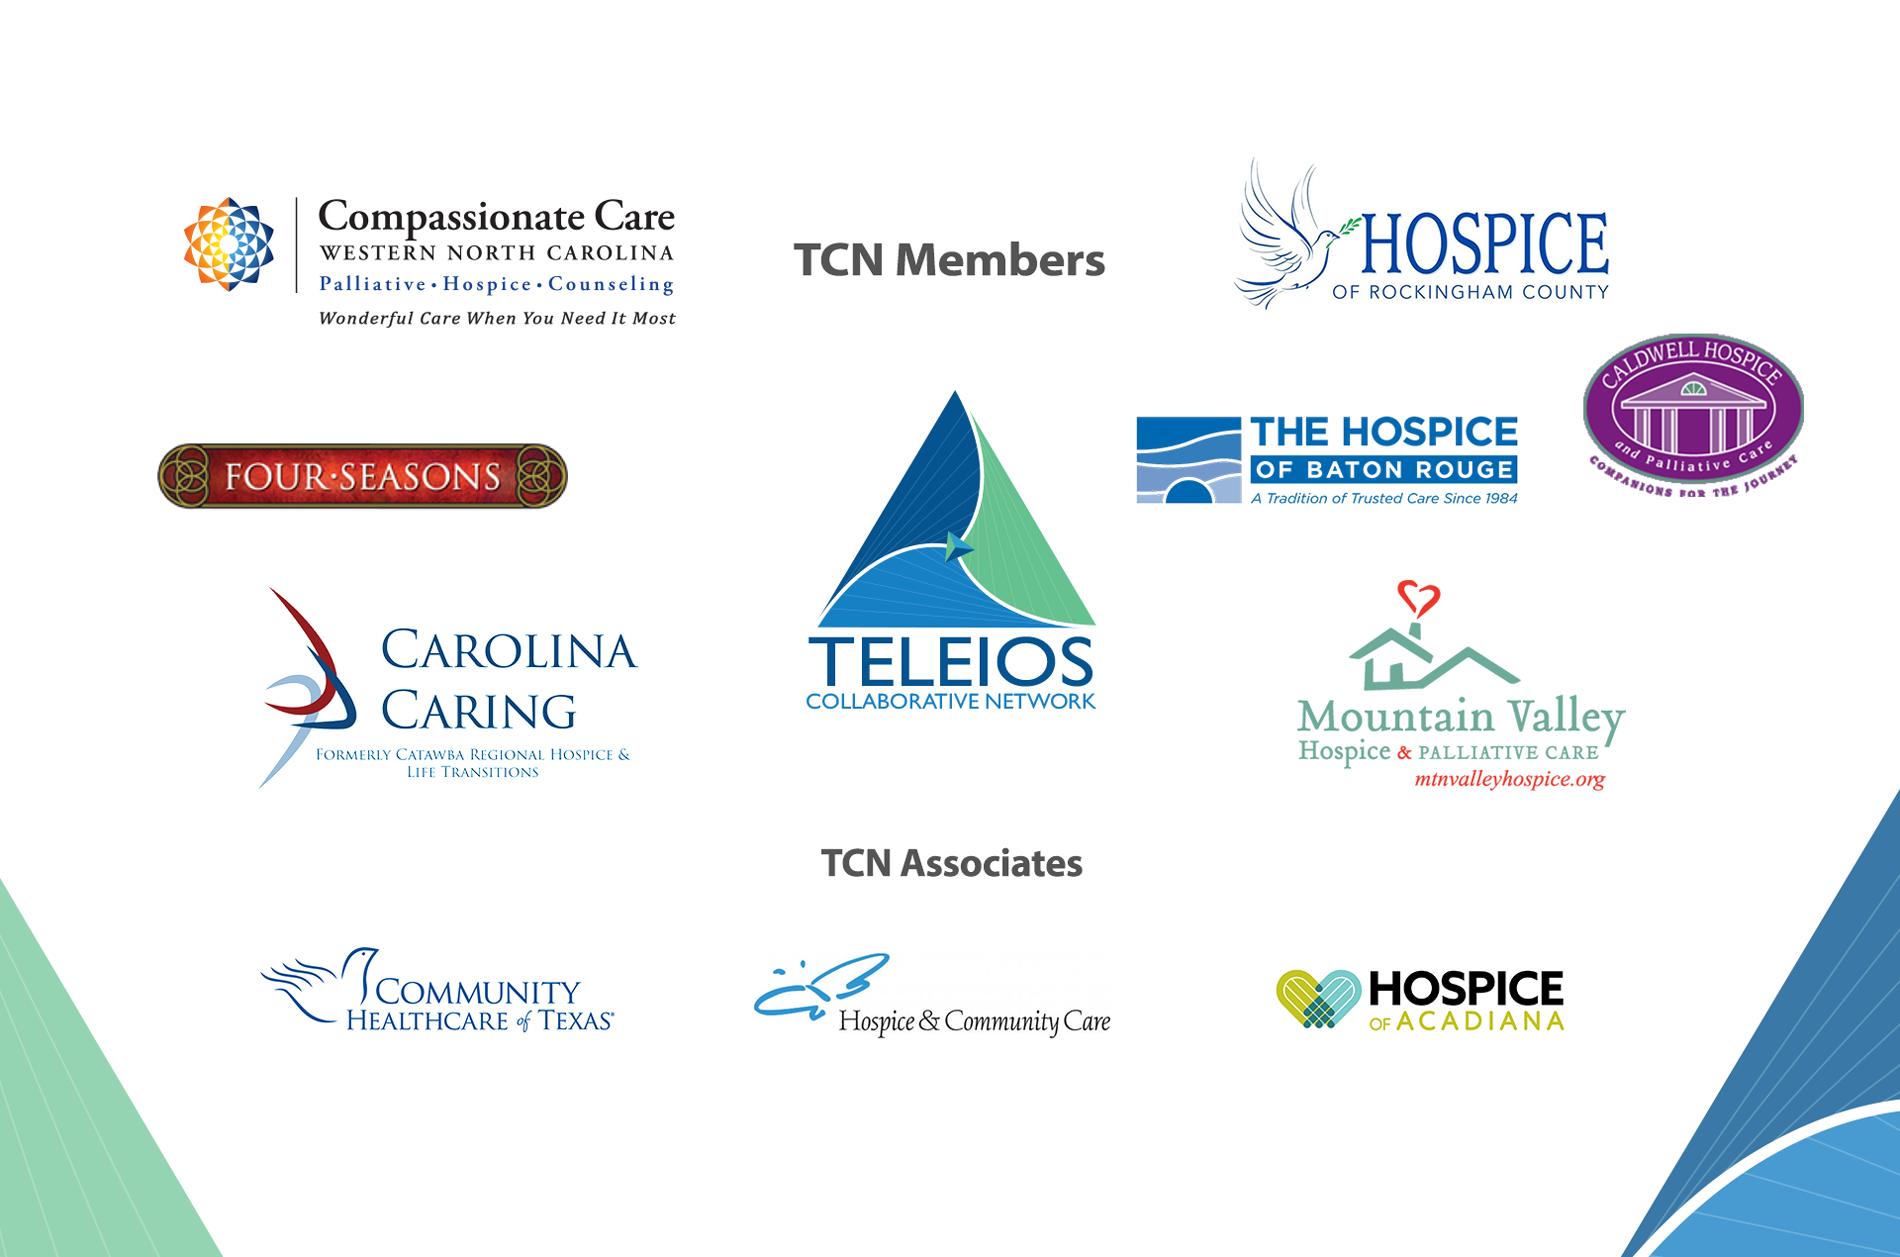 TCN_members_assoc_2020